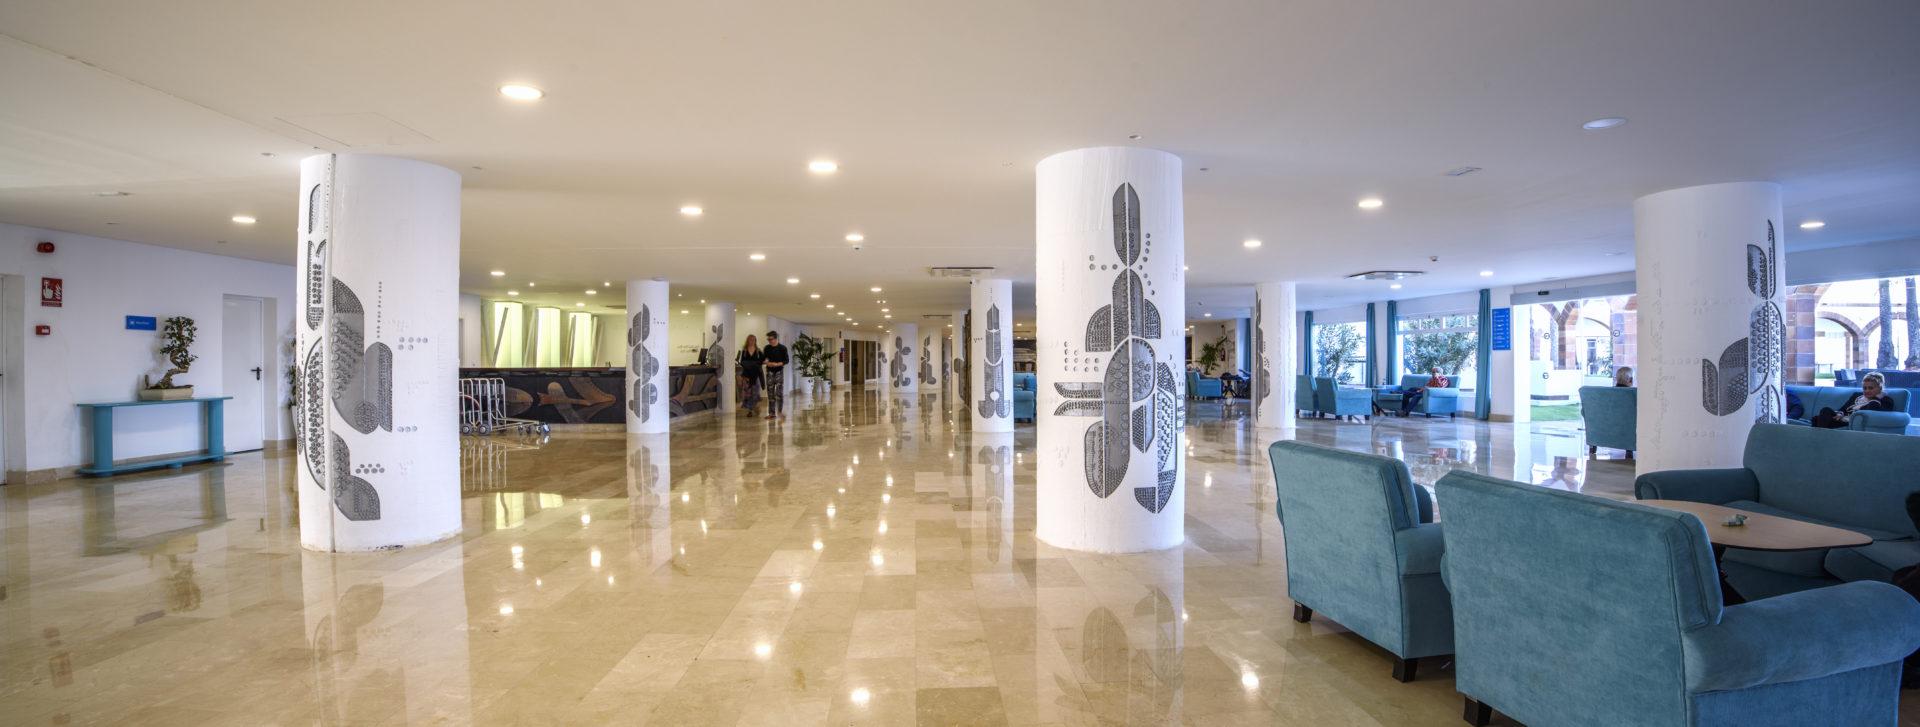 Hotel Doblemar 2-251-La Manga Urdecon